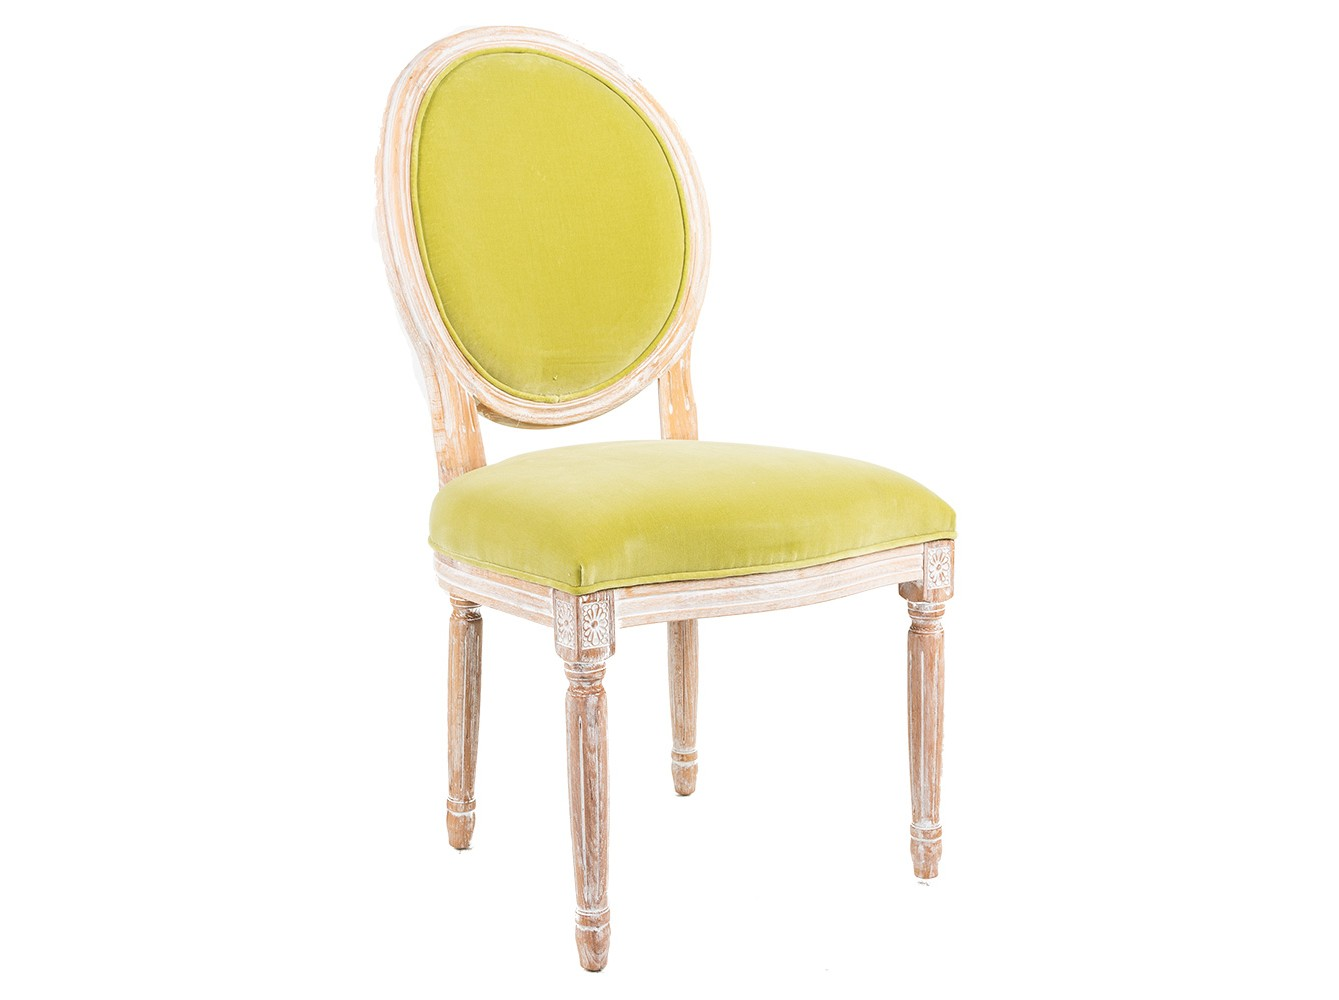 Кухонный стул Object Desire 15438275 от thefurnish